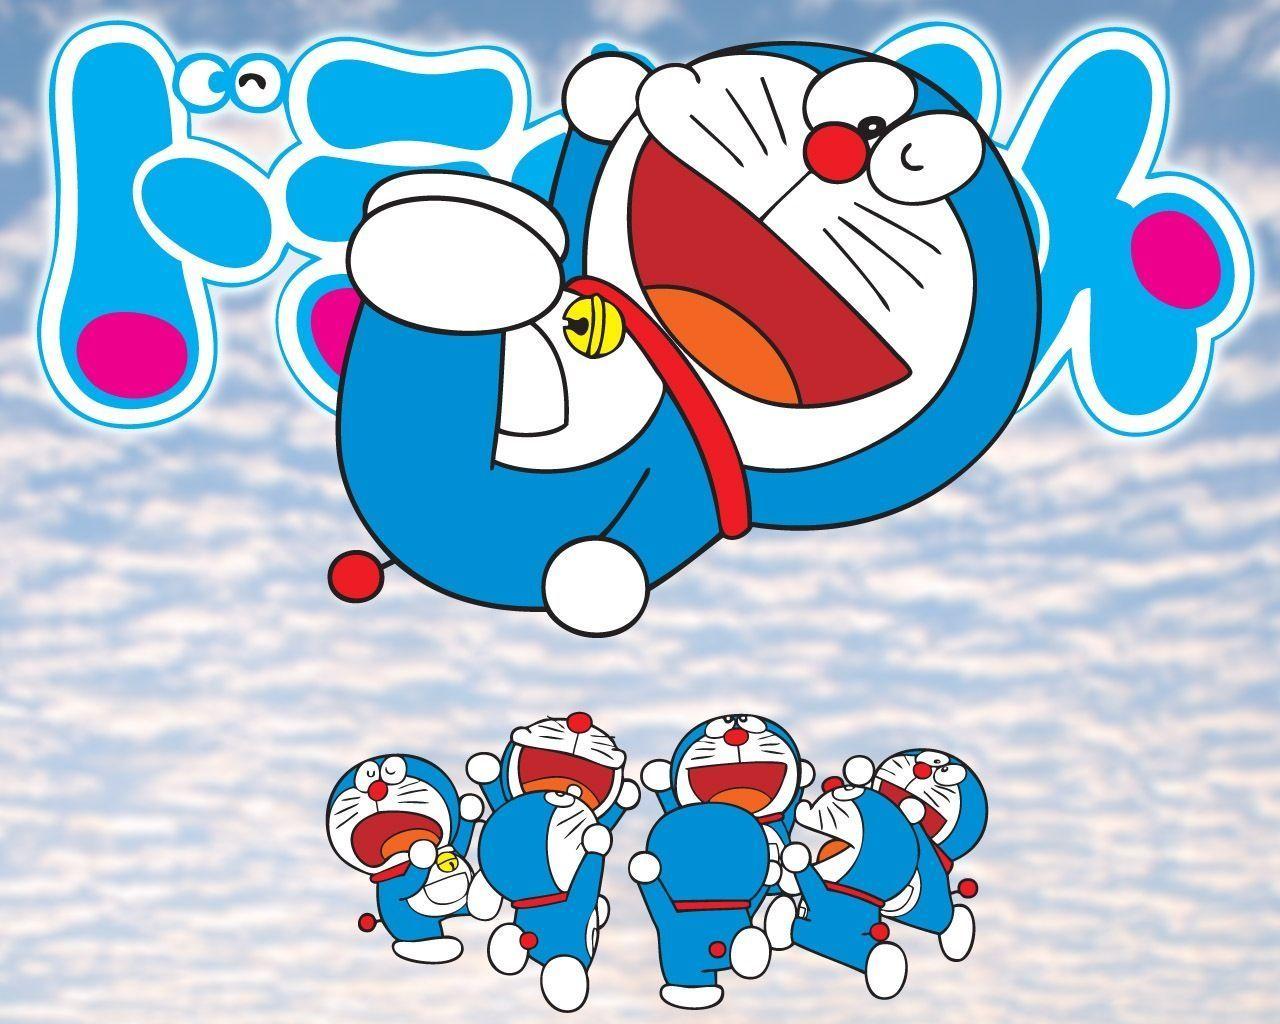 Doraemon 3d Live Wallpaper Download Kertas dinding lucu